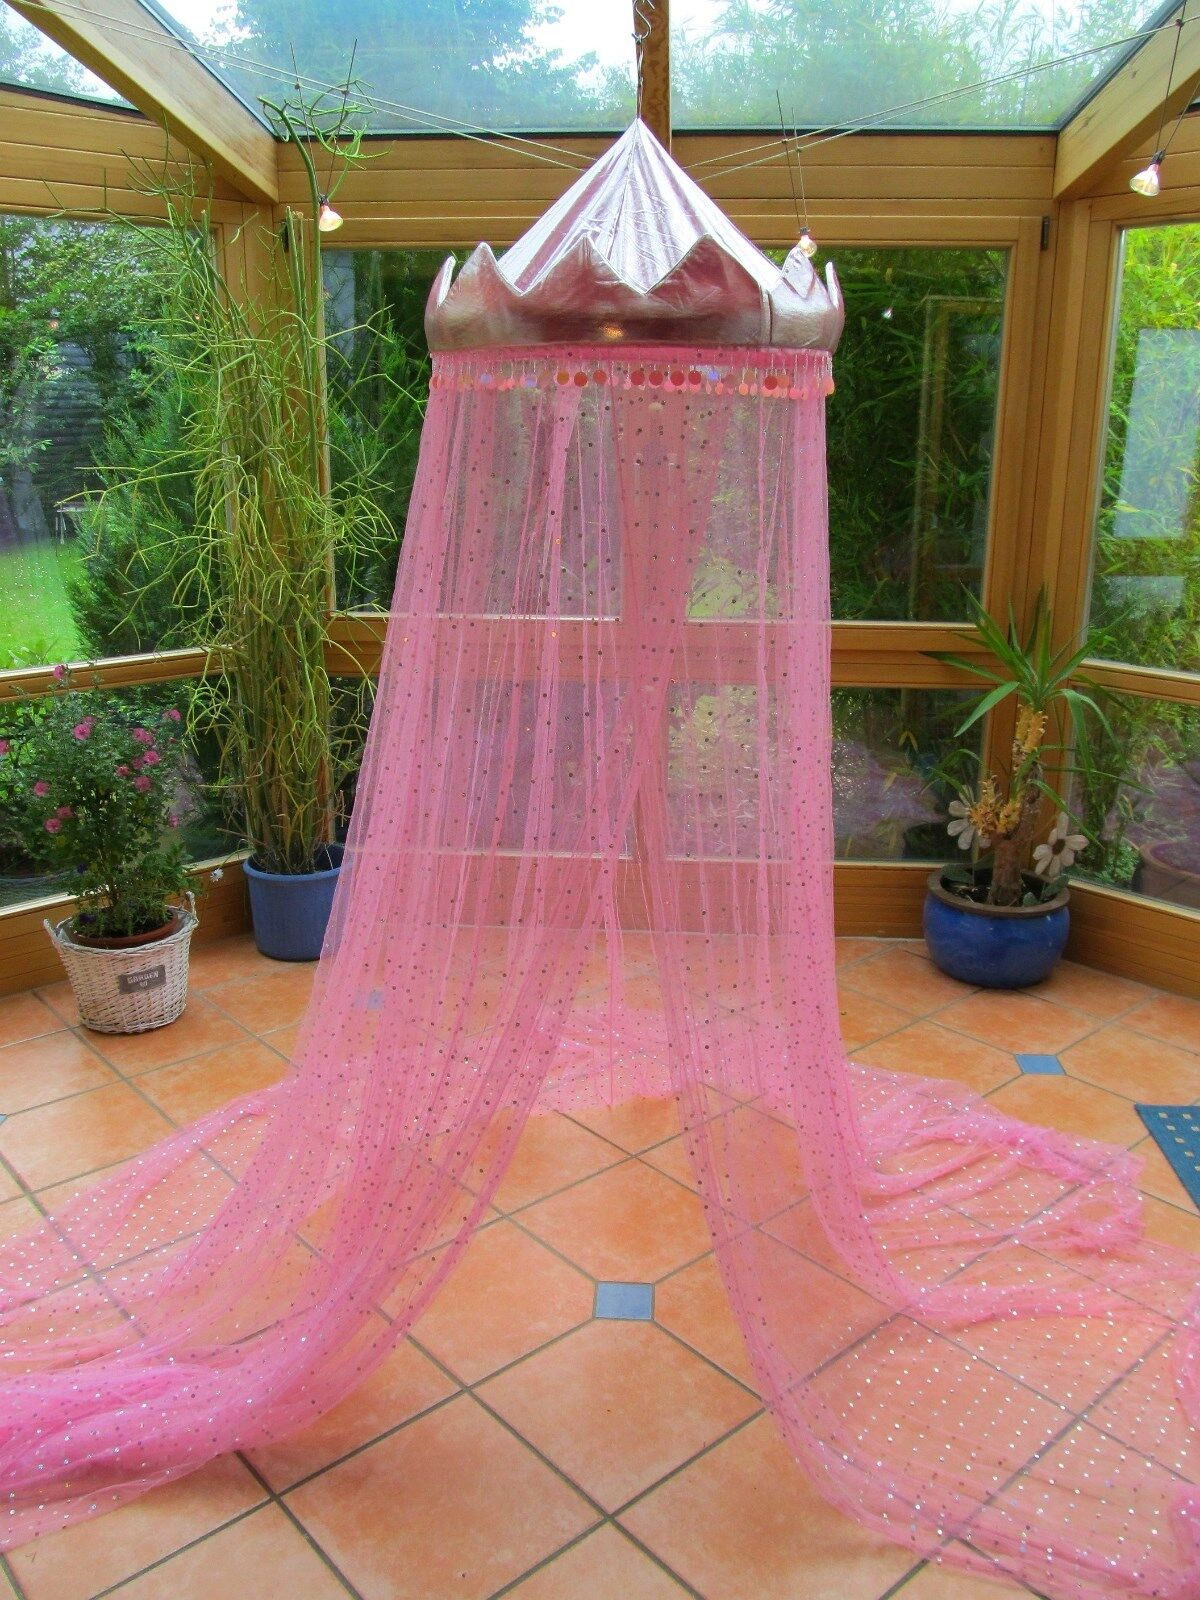 betthimmel baldachin spielzelt moskitonetz rosa krone. Black Bedroom Furniture Sets. Home Design Ideas